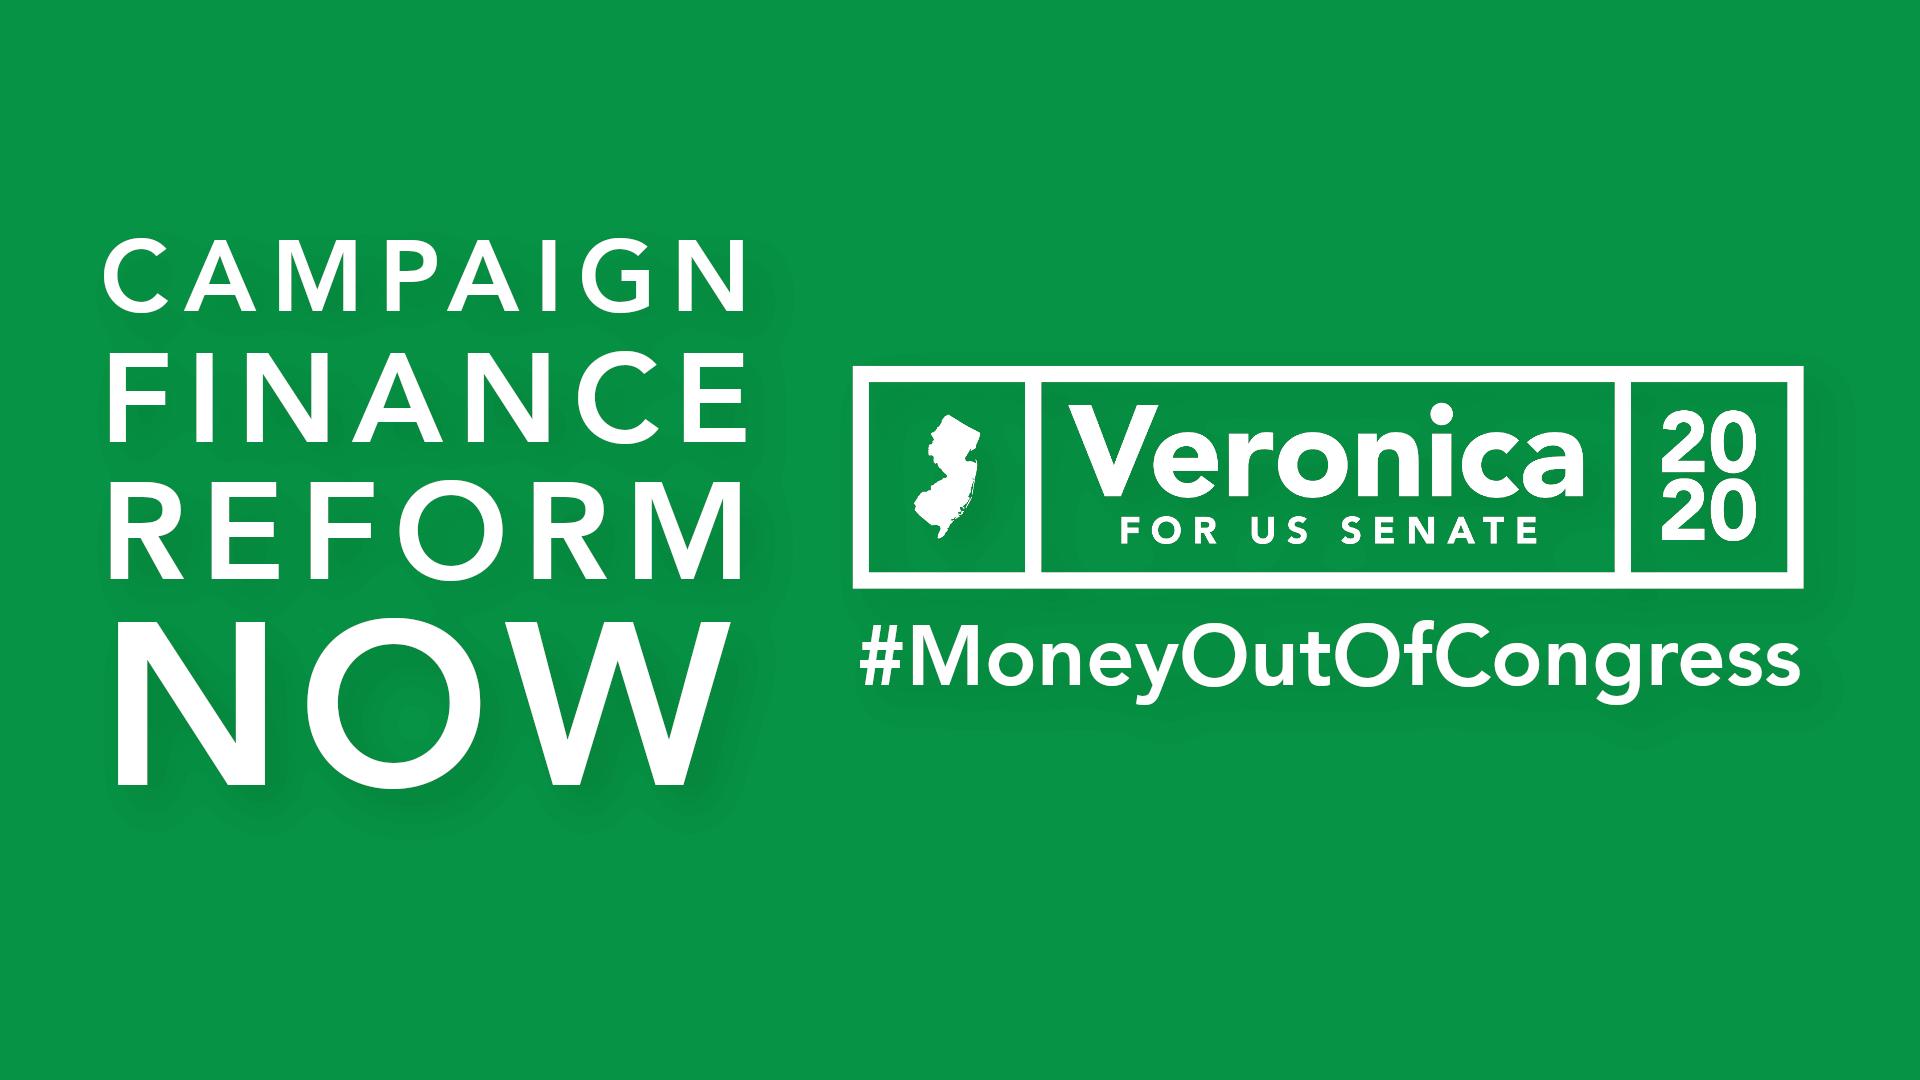 #MoneyOutOfCongress